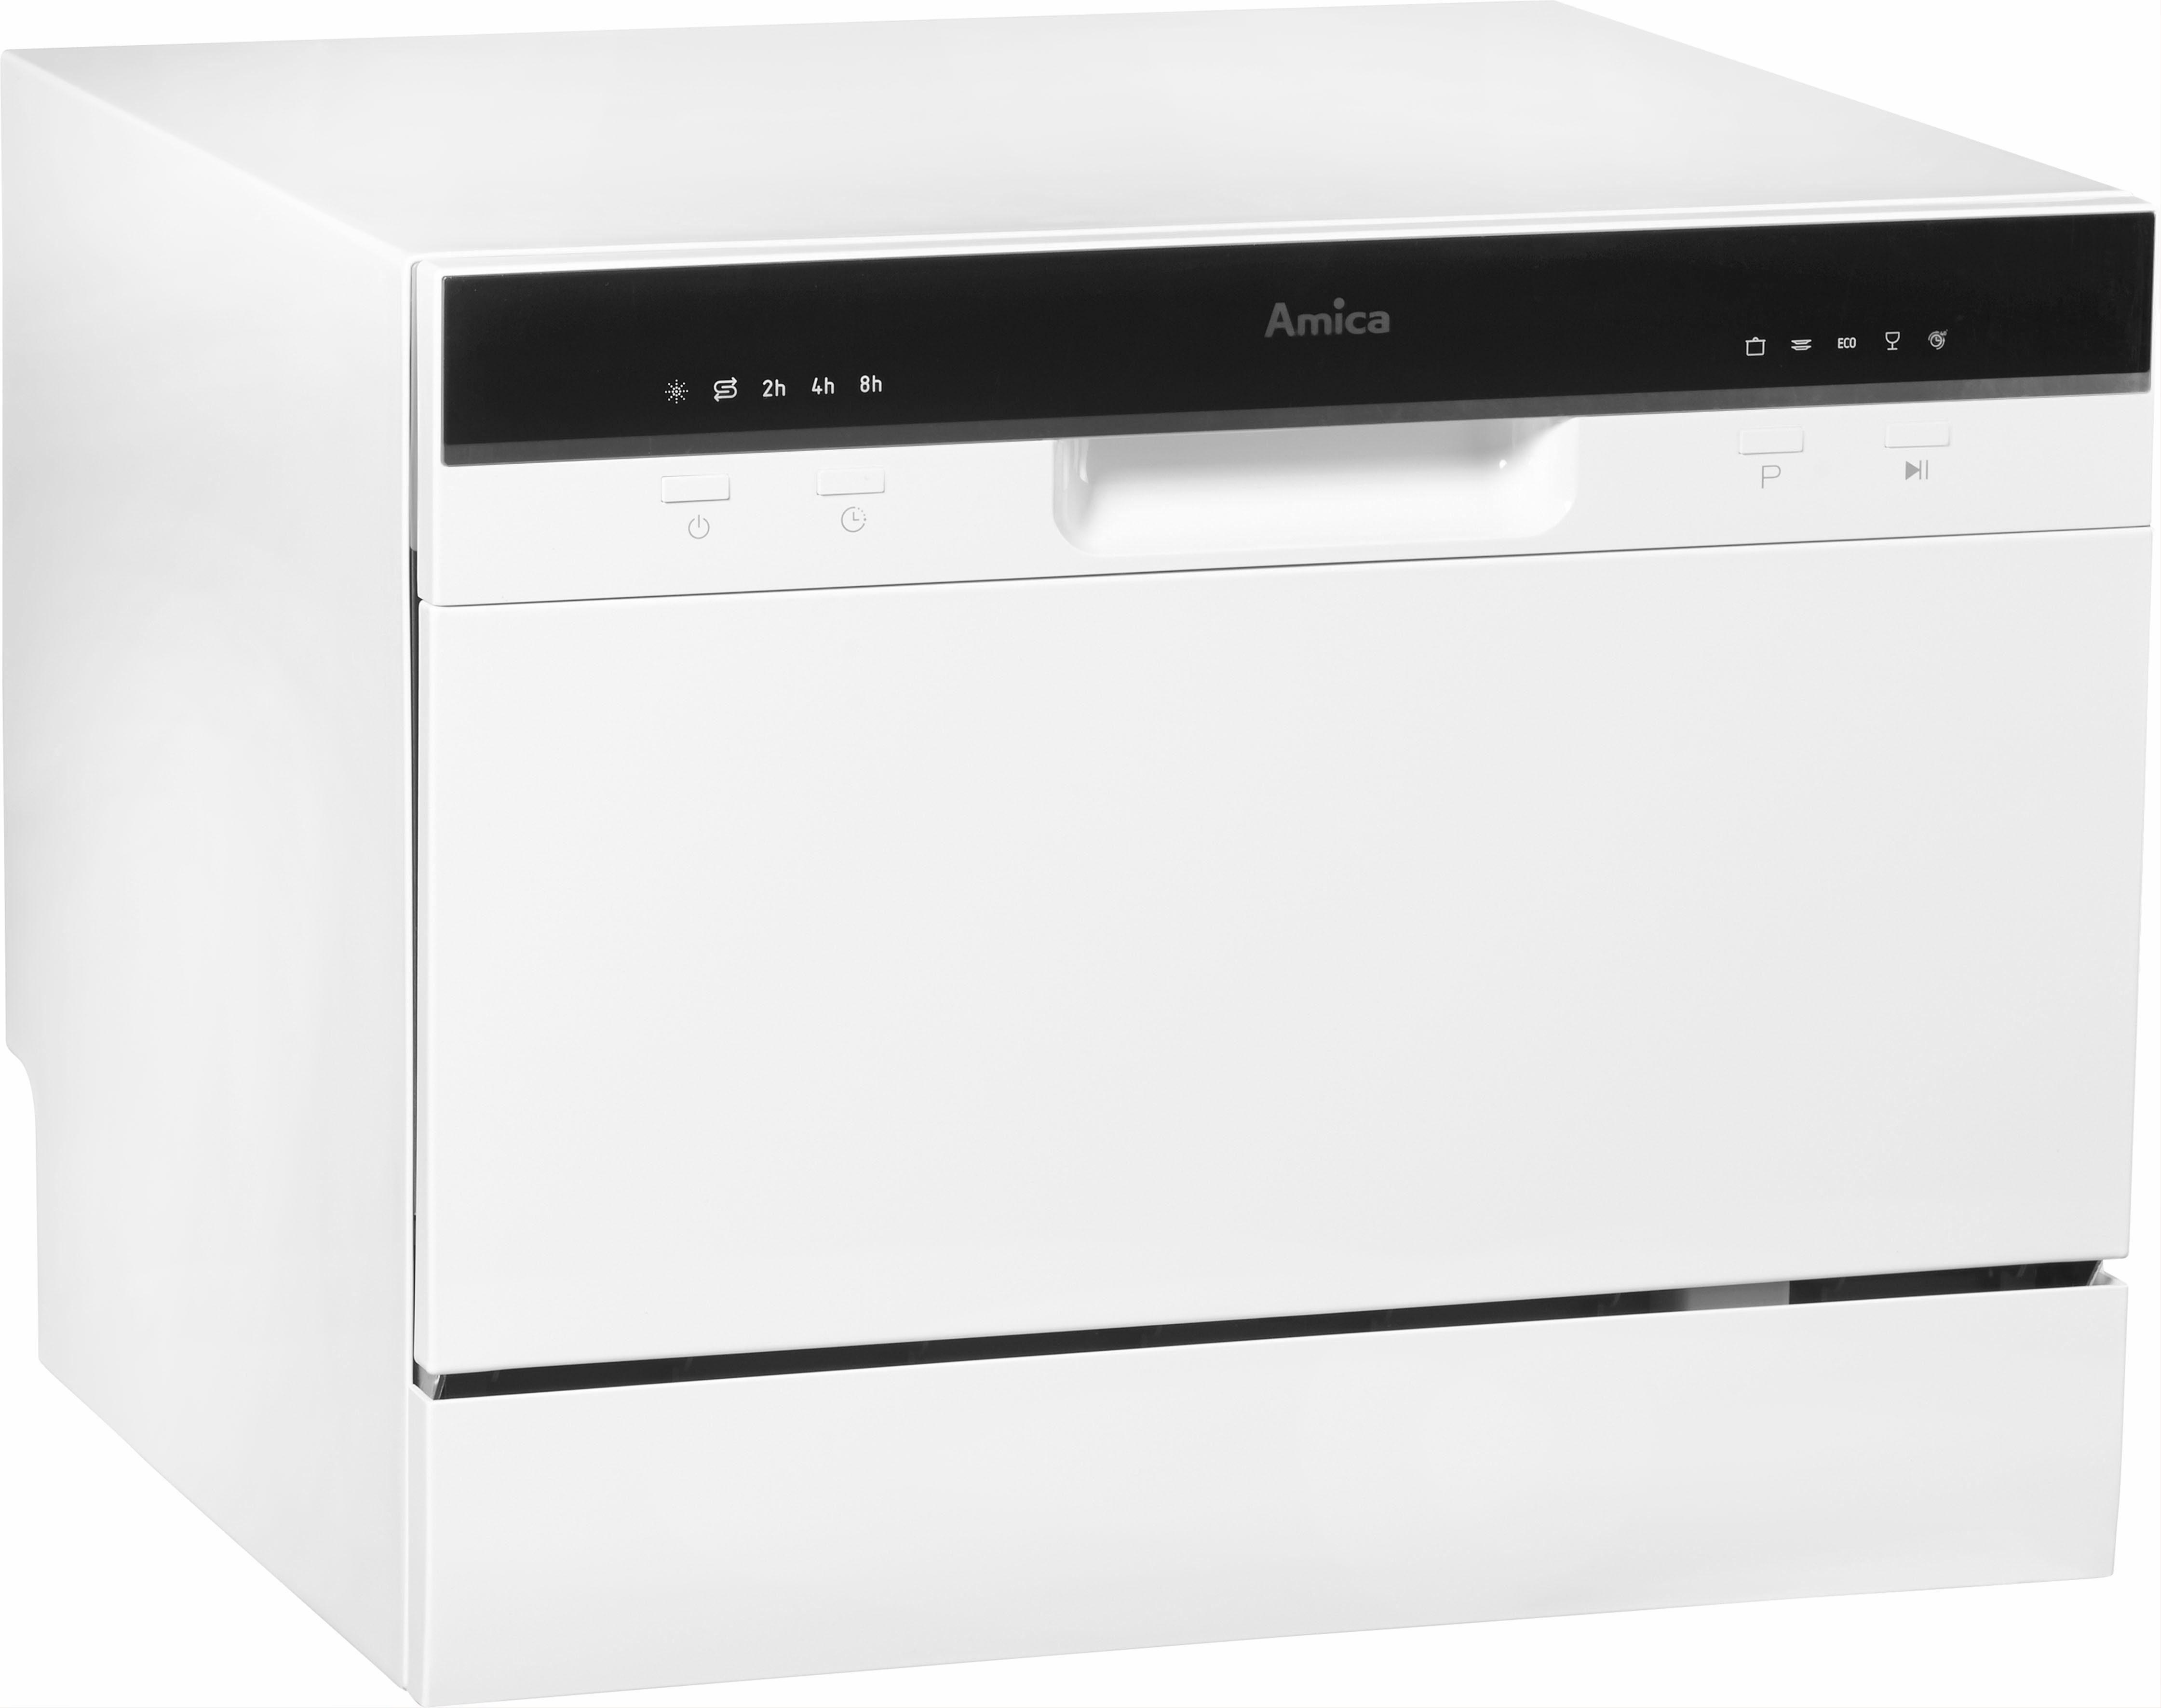 Amica Unterbau Kühlschrank 50 Cm : Amica vks w kühlschrank kühlteil liters amazon